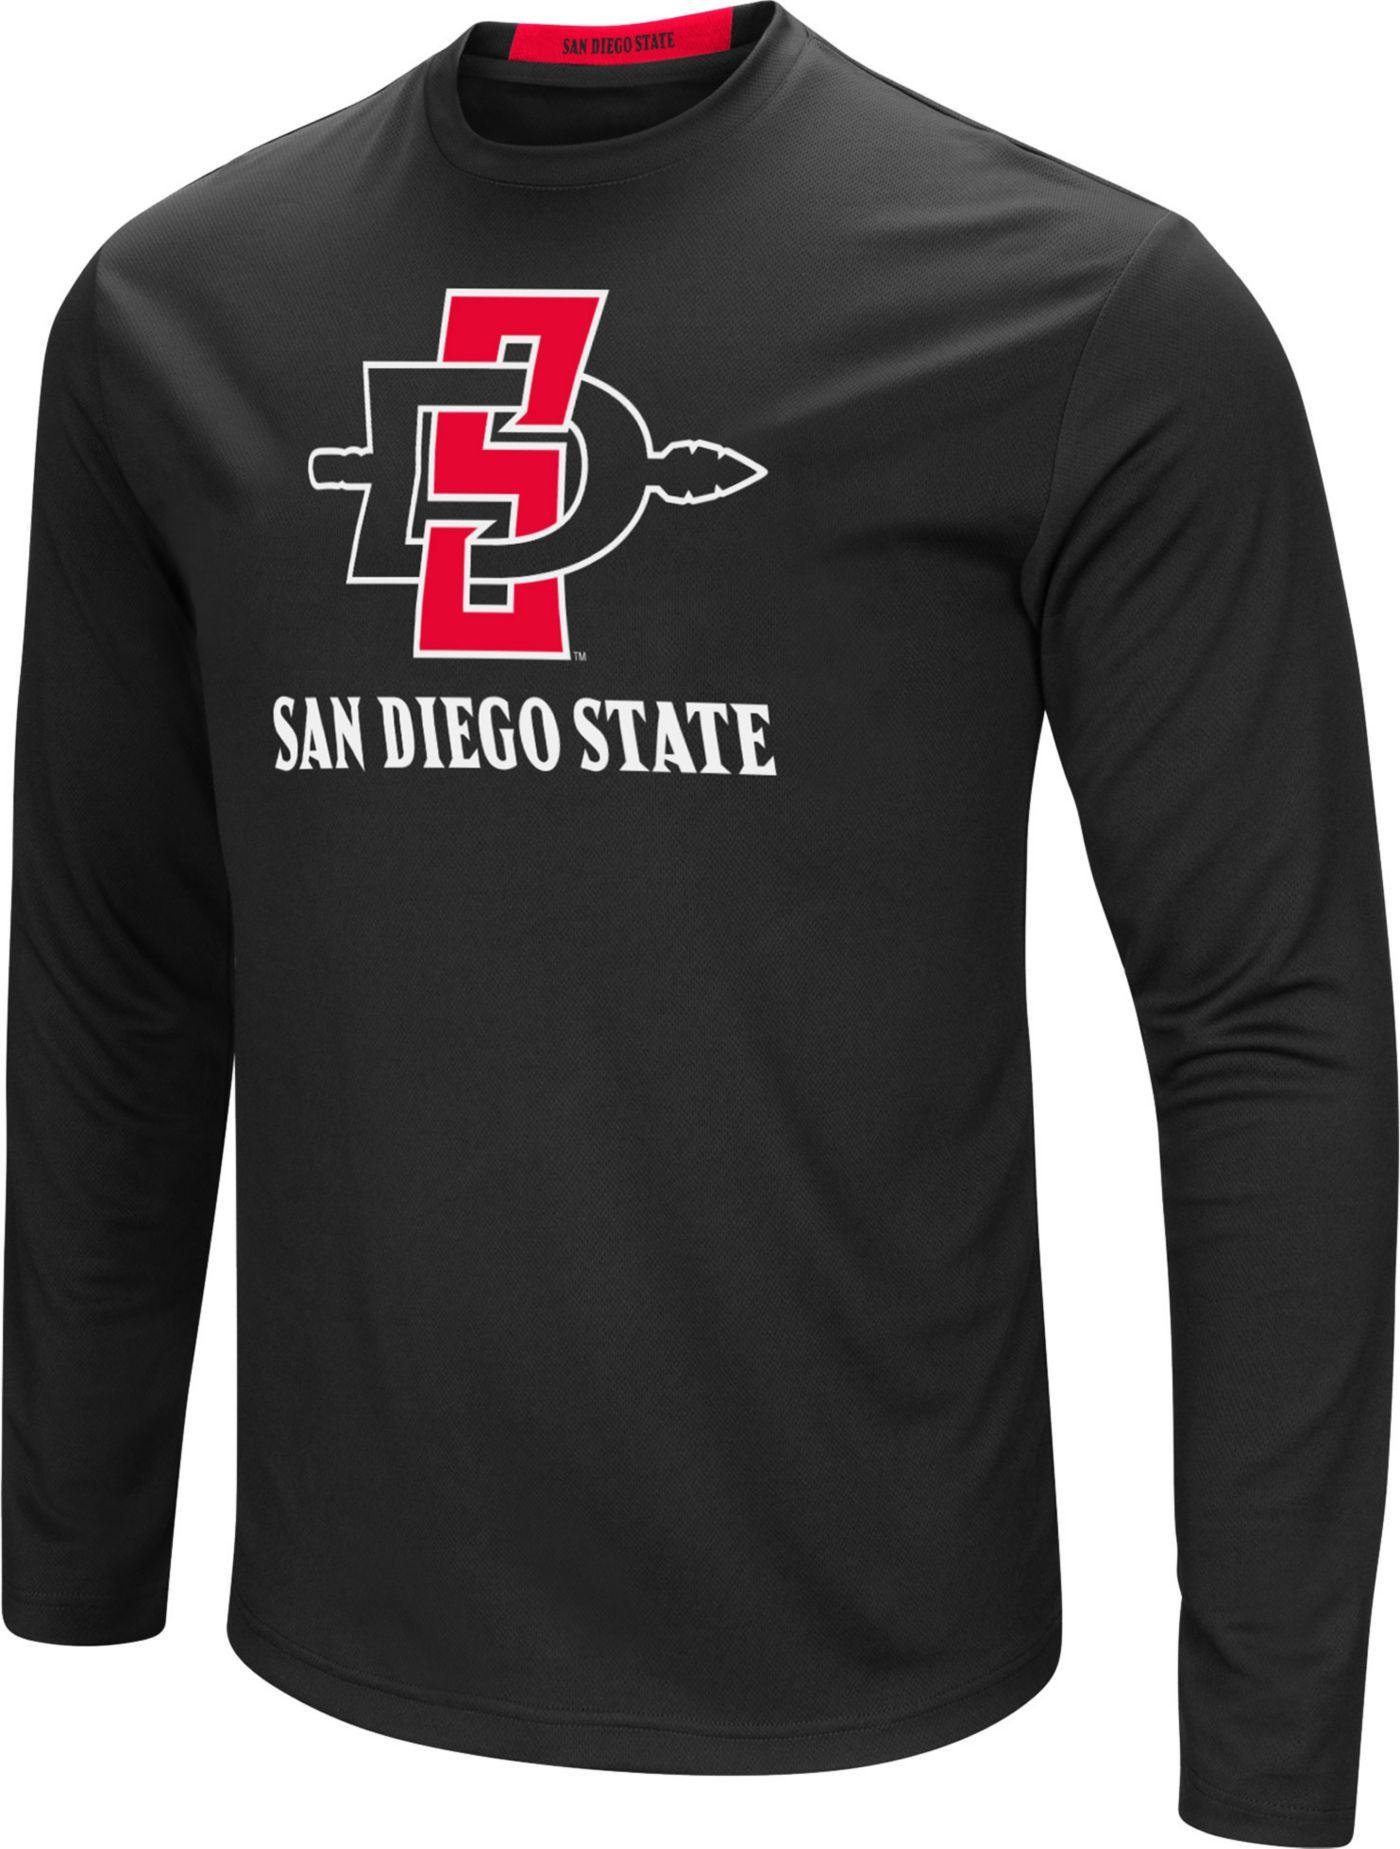 Colosseum Men's San Diego State Aztecs Ganges Long Sleeve Black T-Shirt